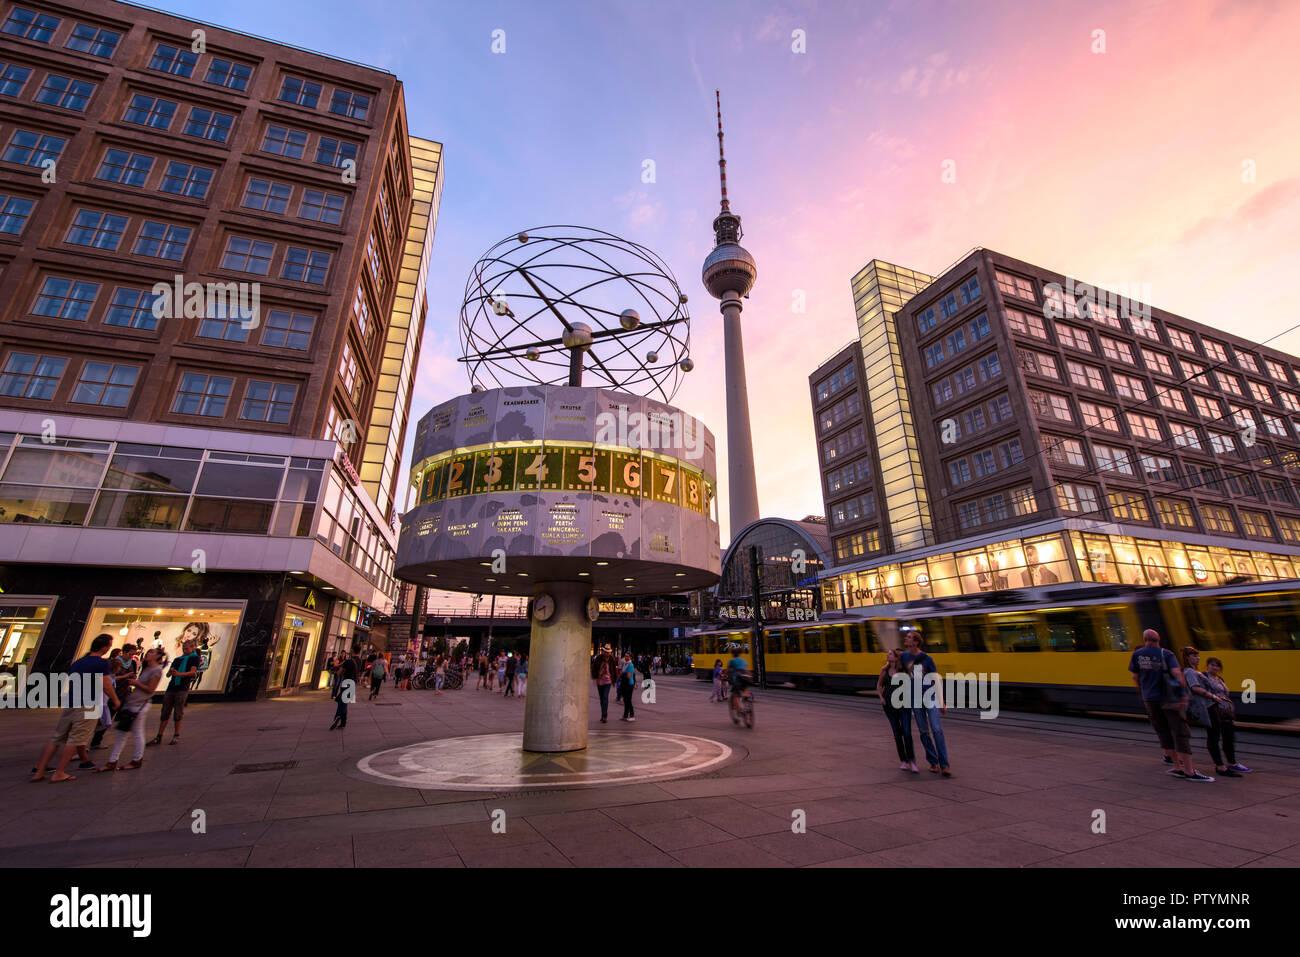 Berlin. Germany. The World Time Clock (Weltzeituhr) and Fernsehturm TV tower on Alexanderplatz. Stock Photo